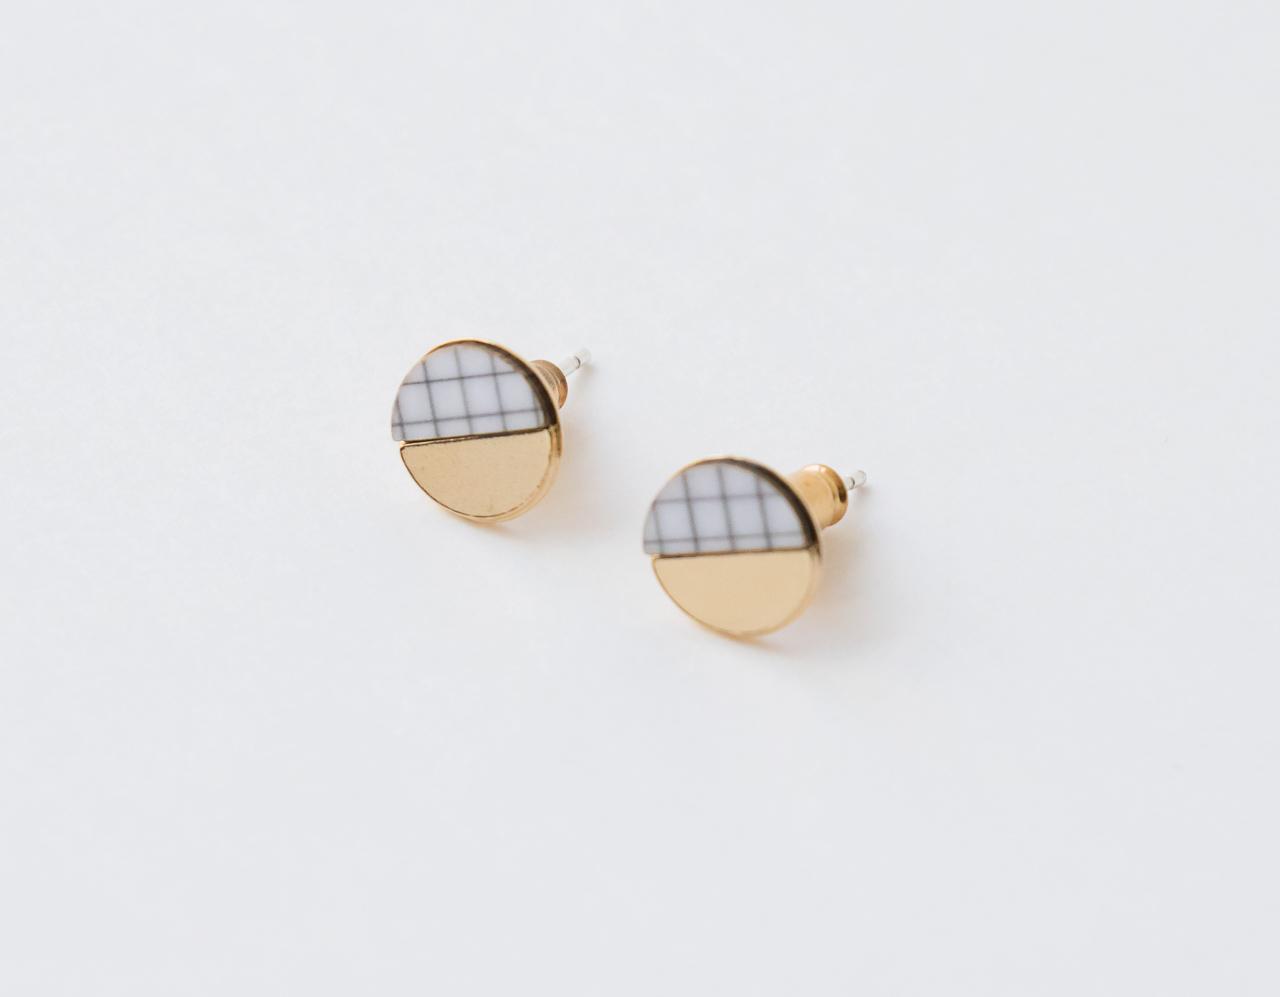 Boucles d'oreilles pi Shlomit ofir - Maison Mathuvu